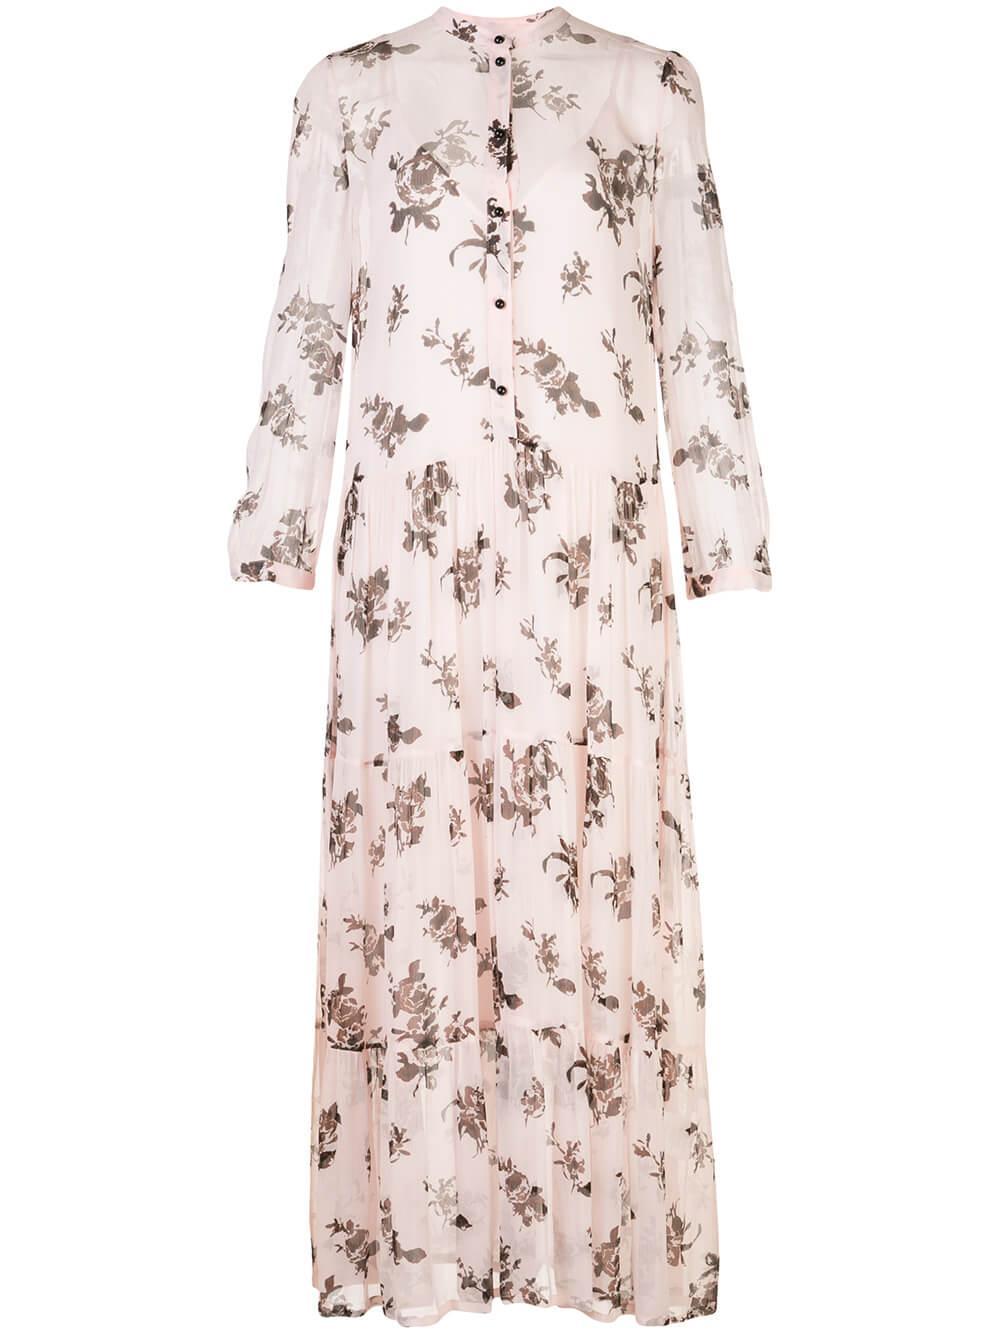 Aia Printed Maxi Dress Item # 20713